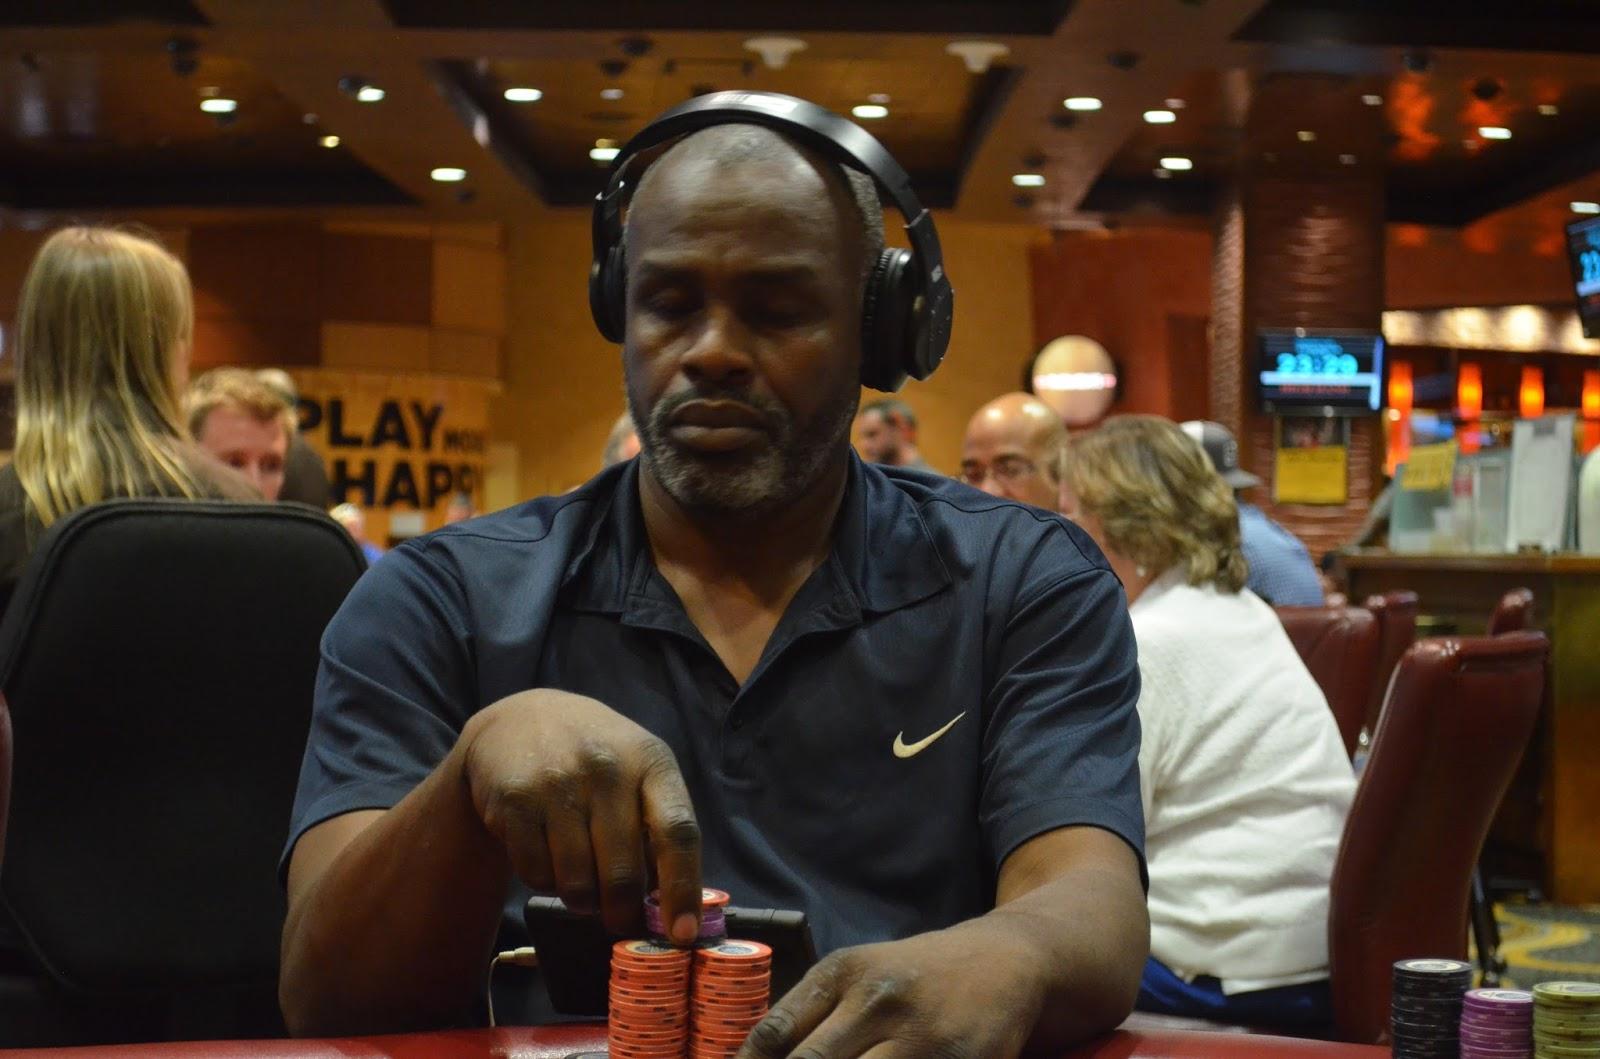 Zach epstein poker player poker room cannes croisette